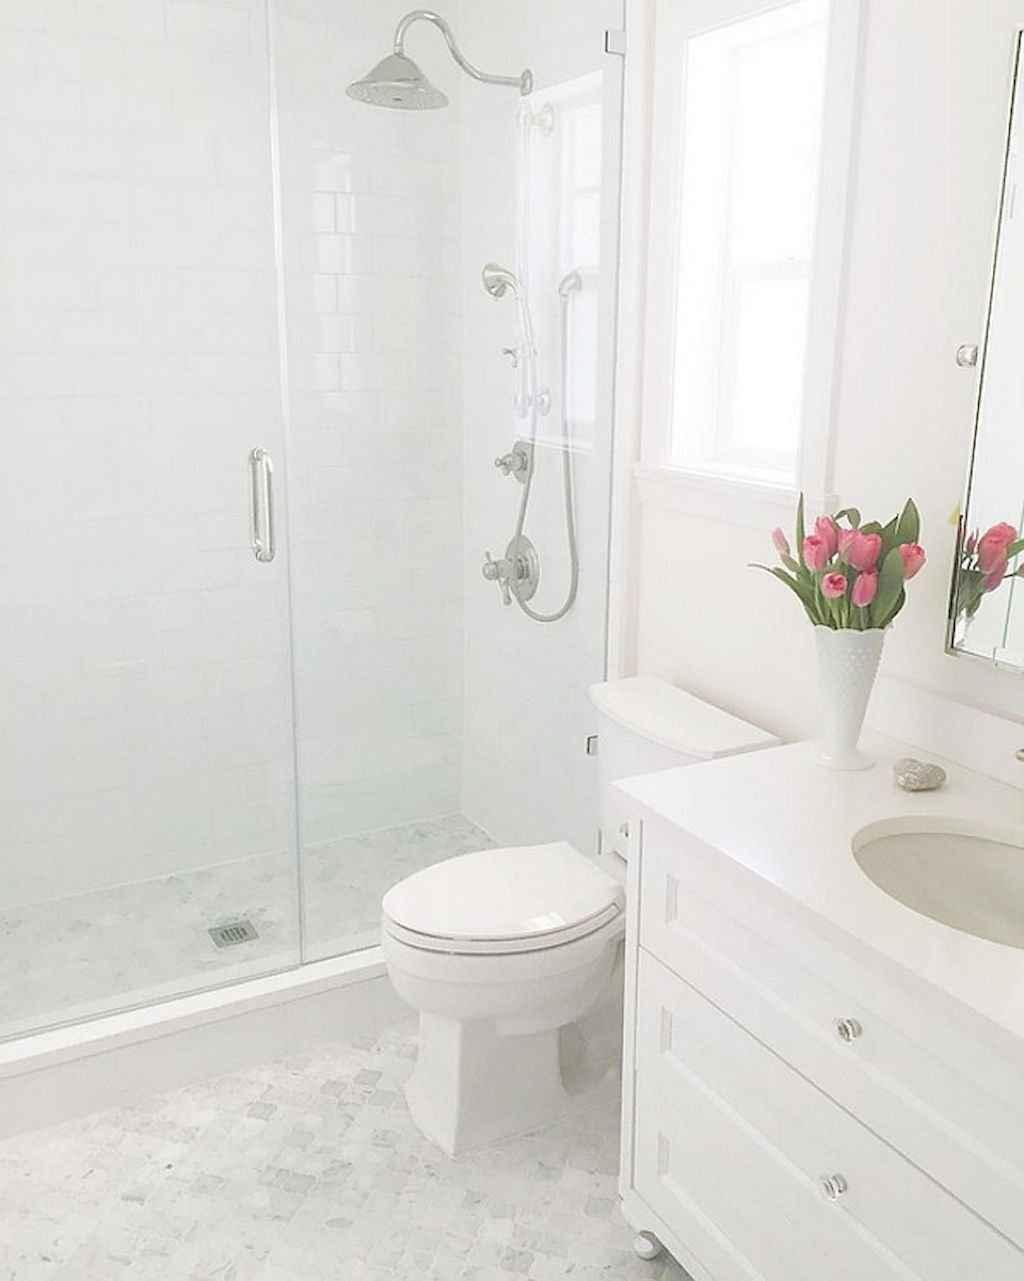 Inspiring apartment bathroom remodel ideas on a budget (39)